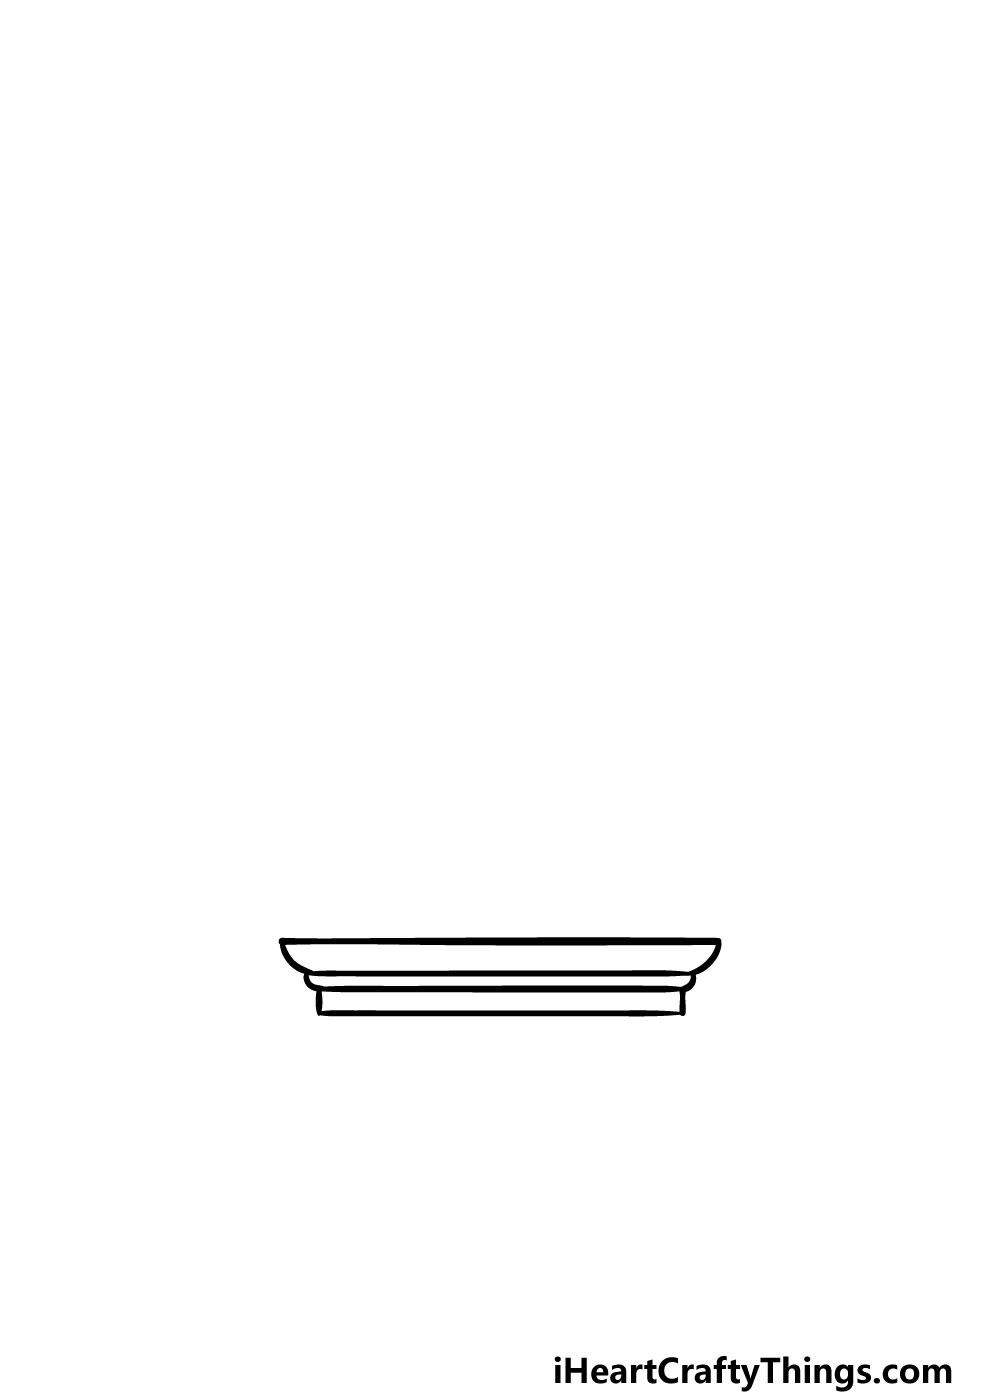 drawing a window step 1